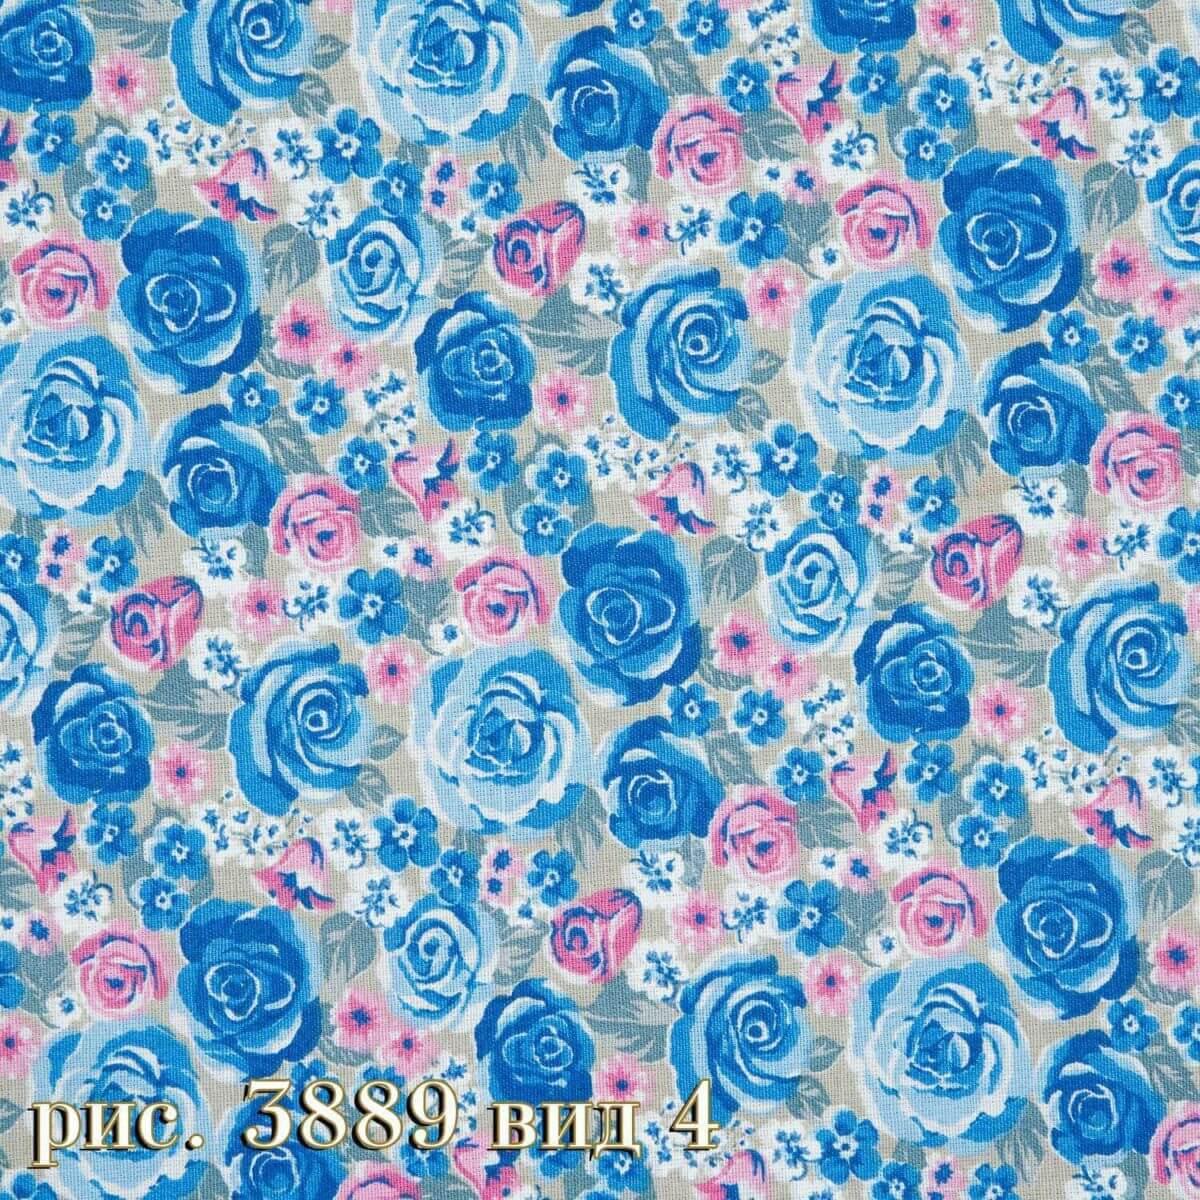 Фото 18 - Плательная ткань бязь 150 см (3889/7) Под заказ.